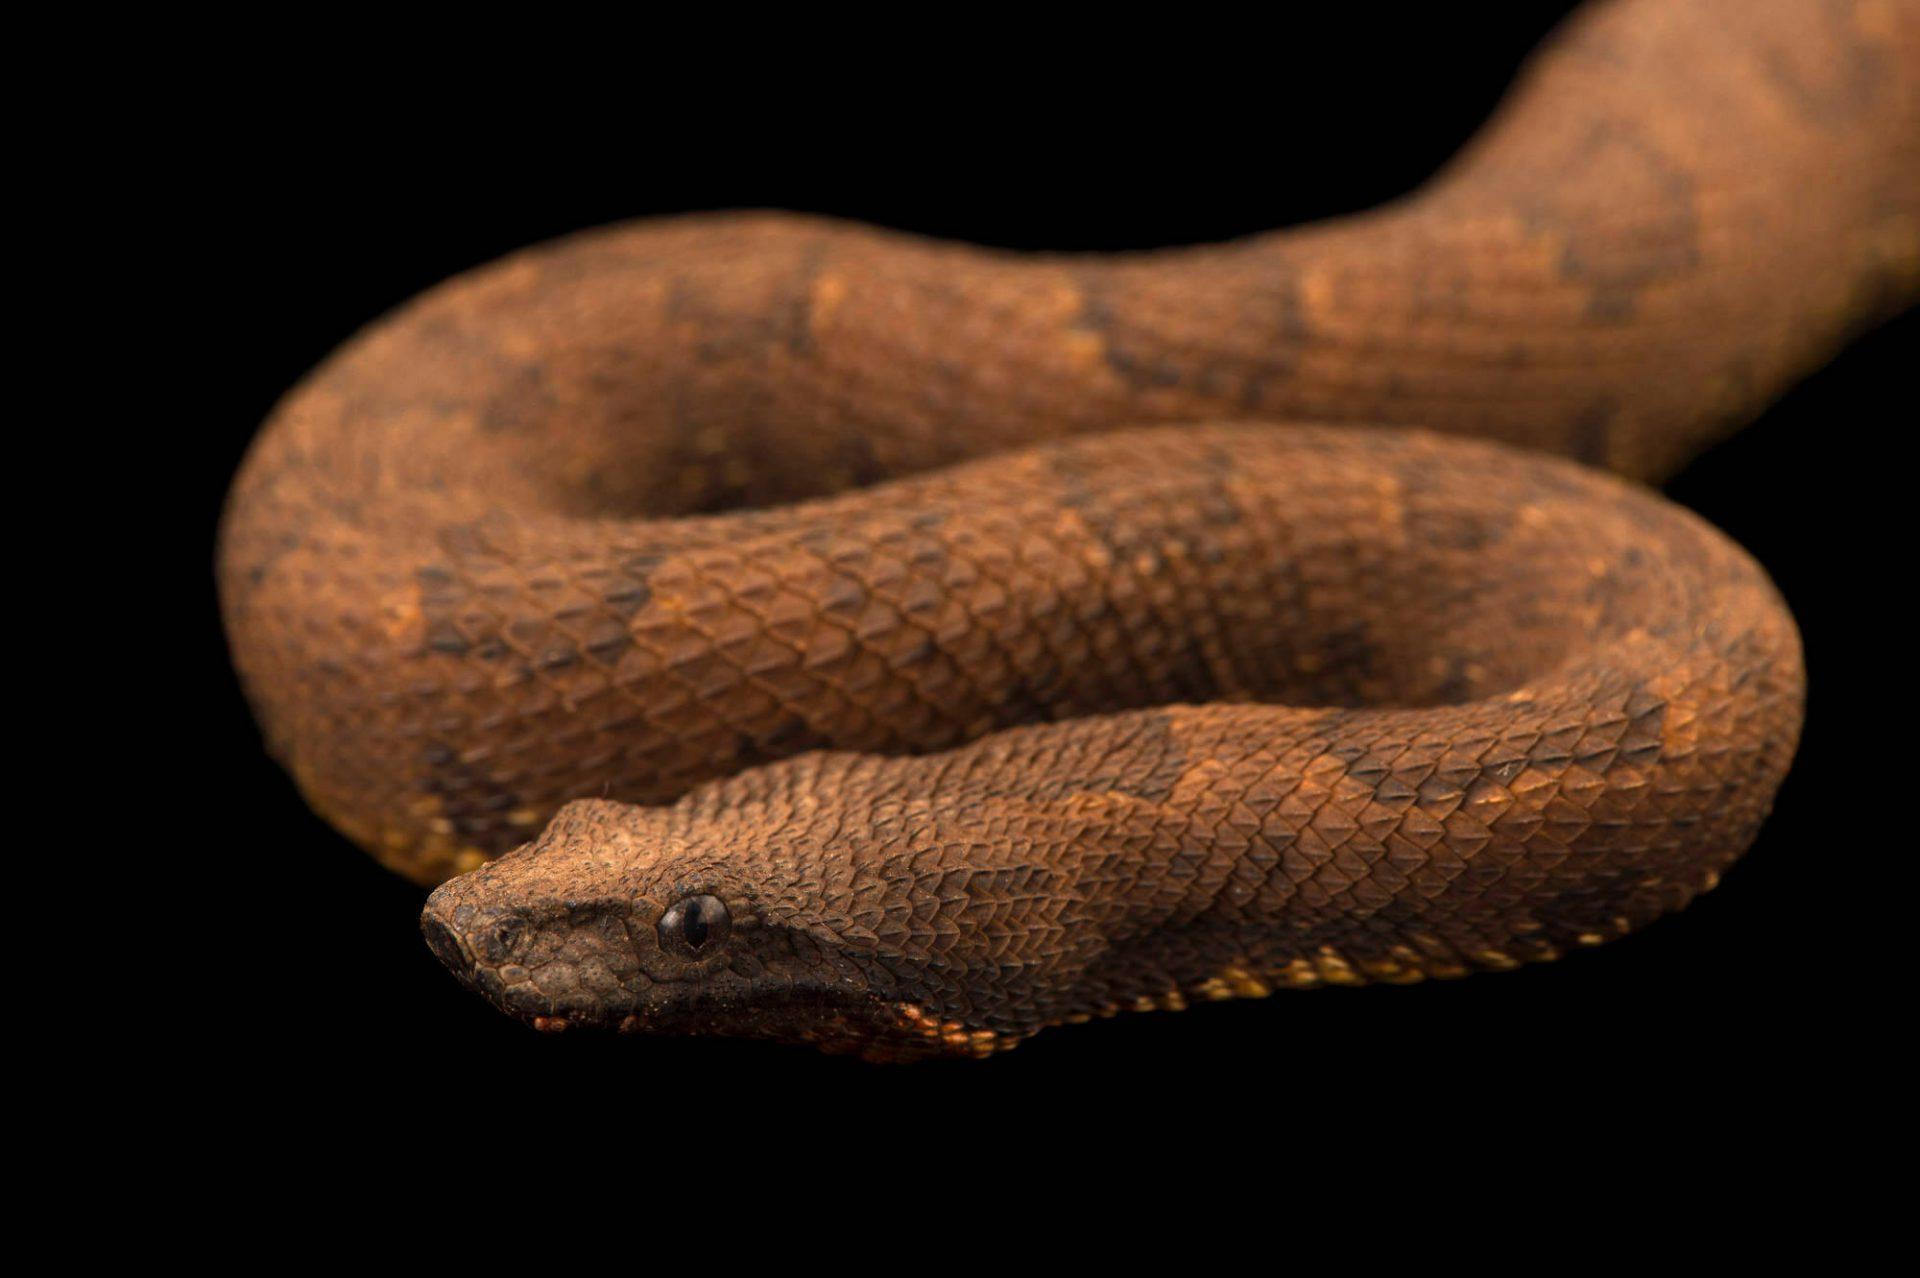 Photo: Viper boa (Candoia aspera) at the Sedgwick County Zoo.